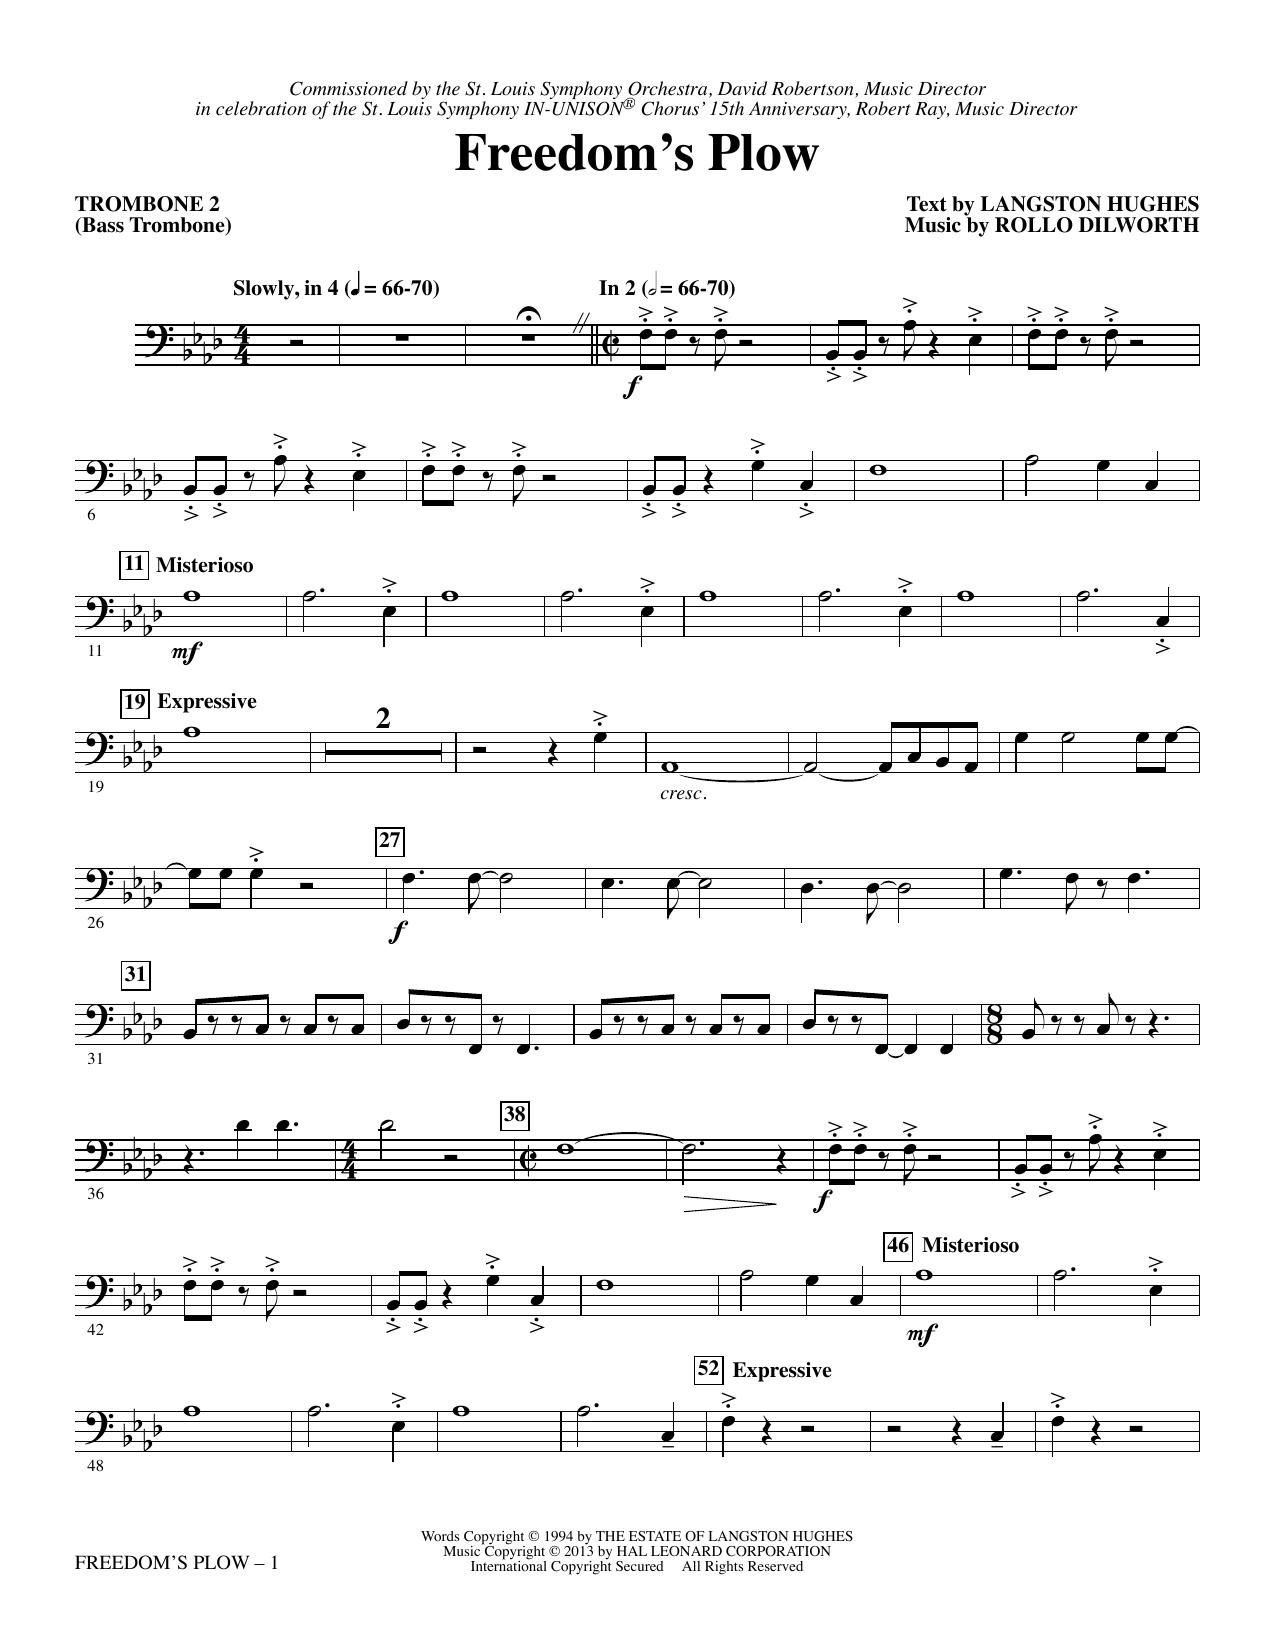 Freedom's Plow - Trombone 2 (Bass Trombone) Sheet Music